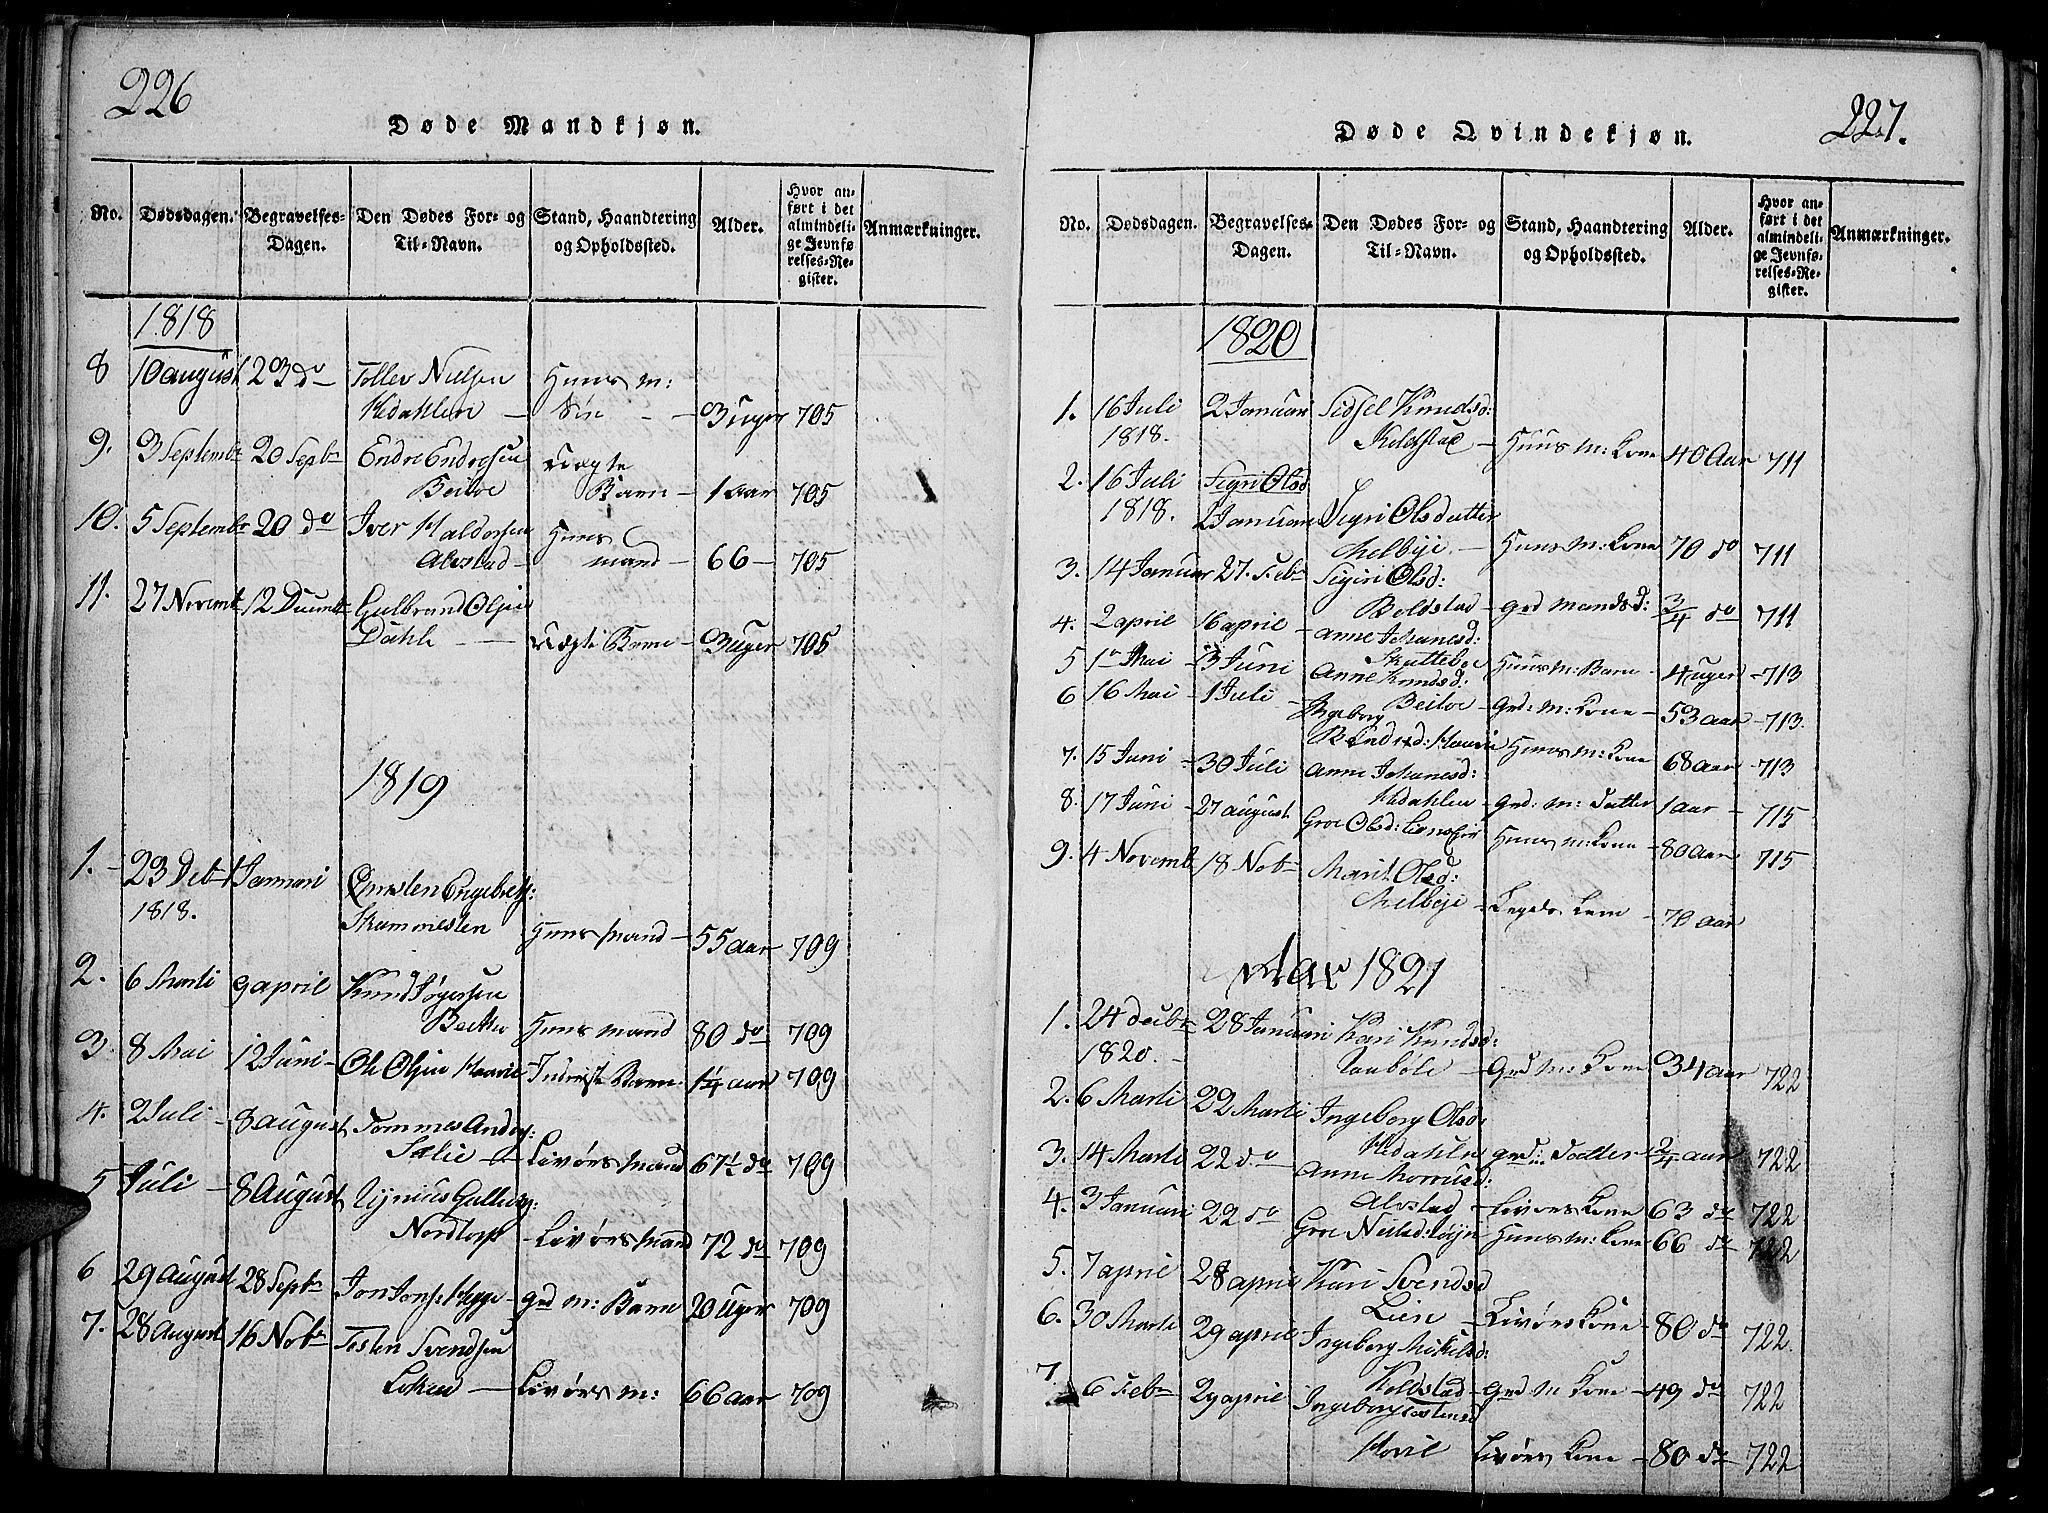 SAH, Slidre prestekontor, Klokkerbok nr. 2, 1814-1839, s. 226-227